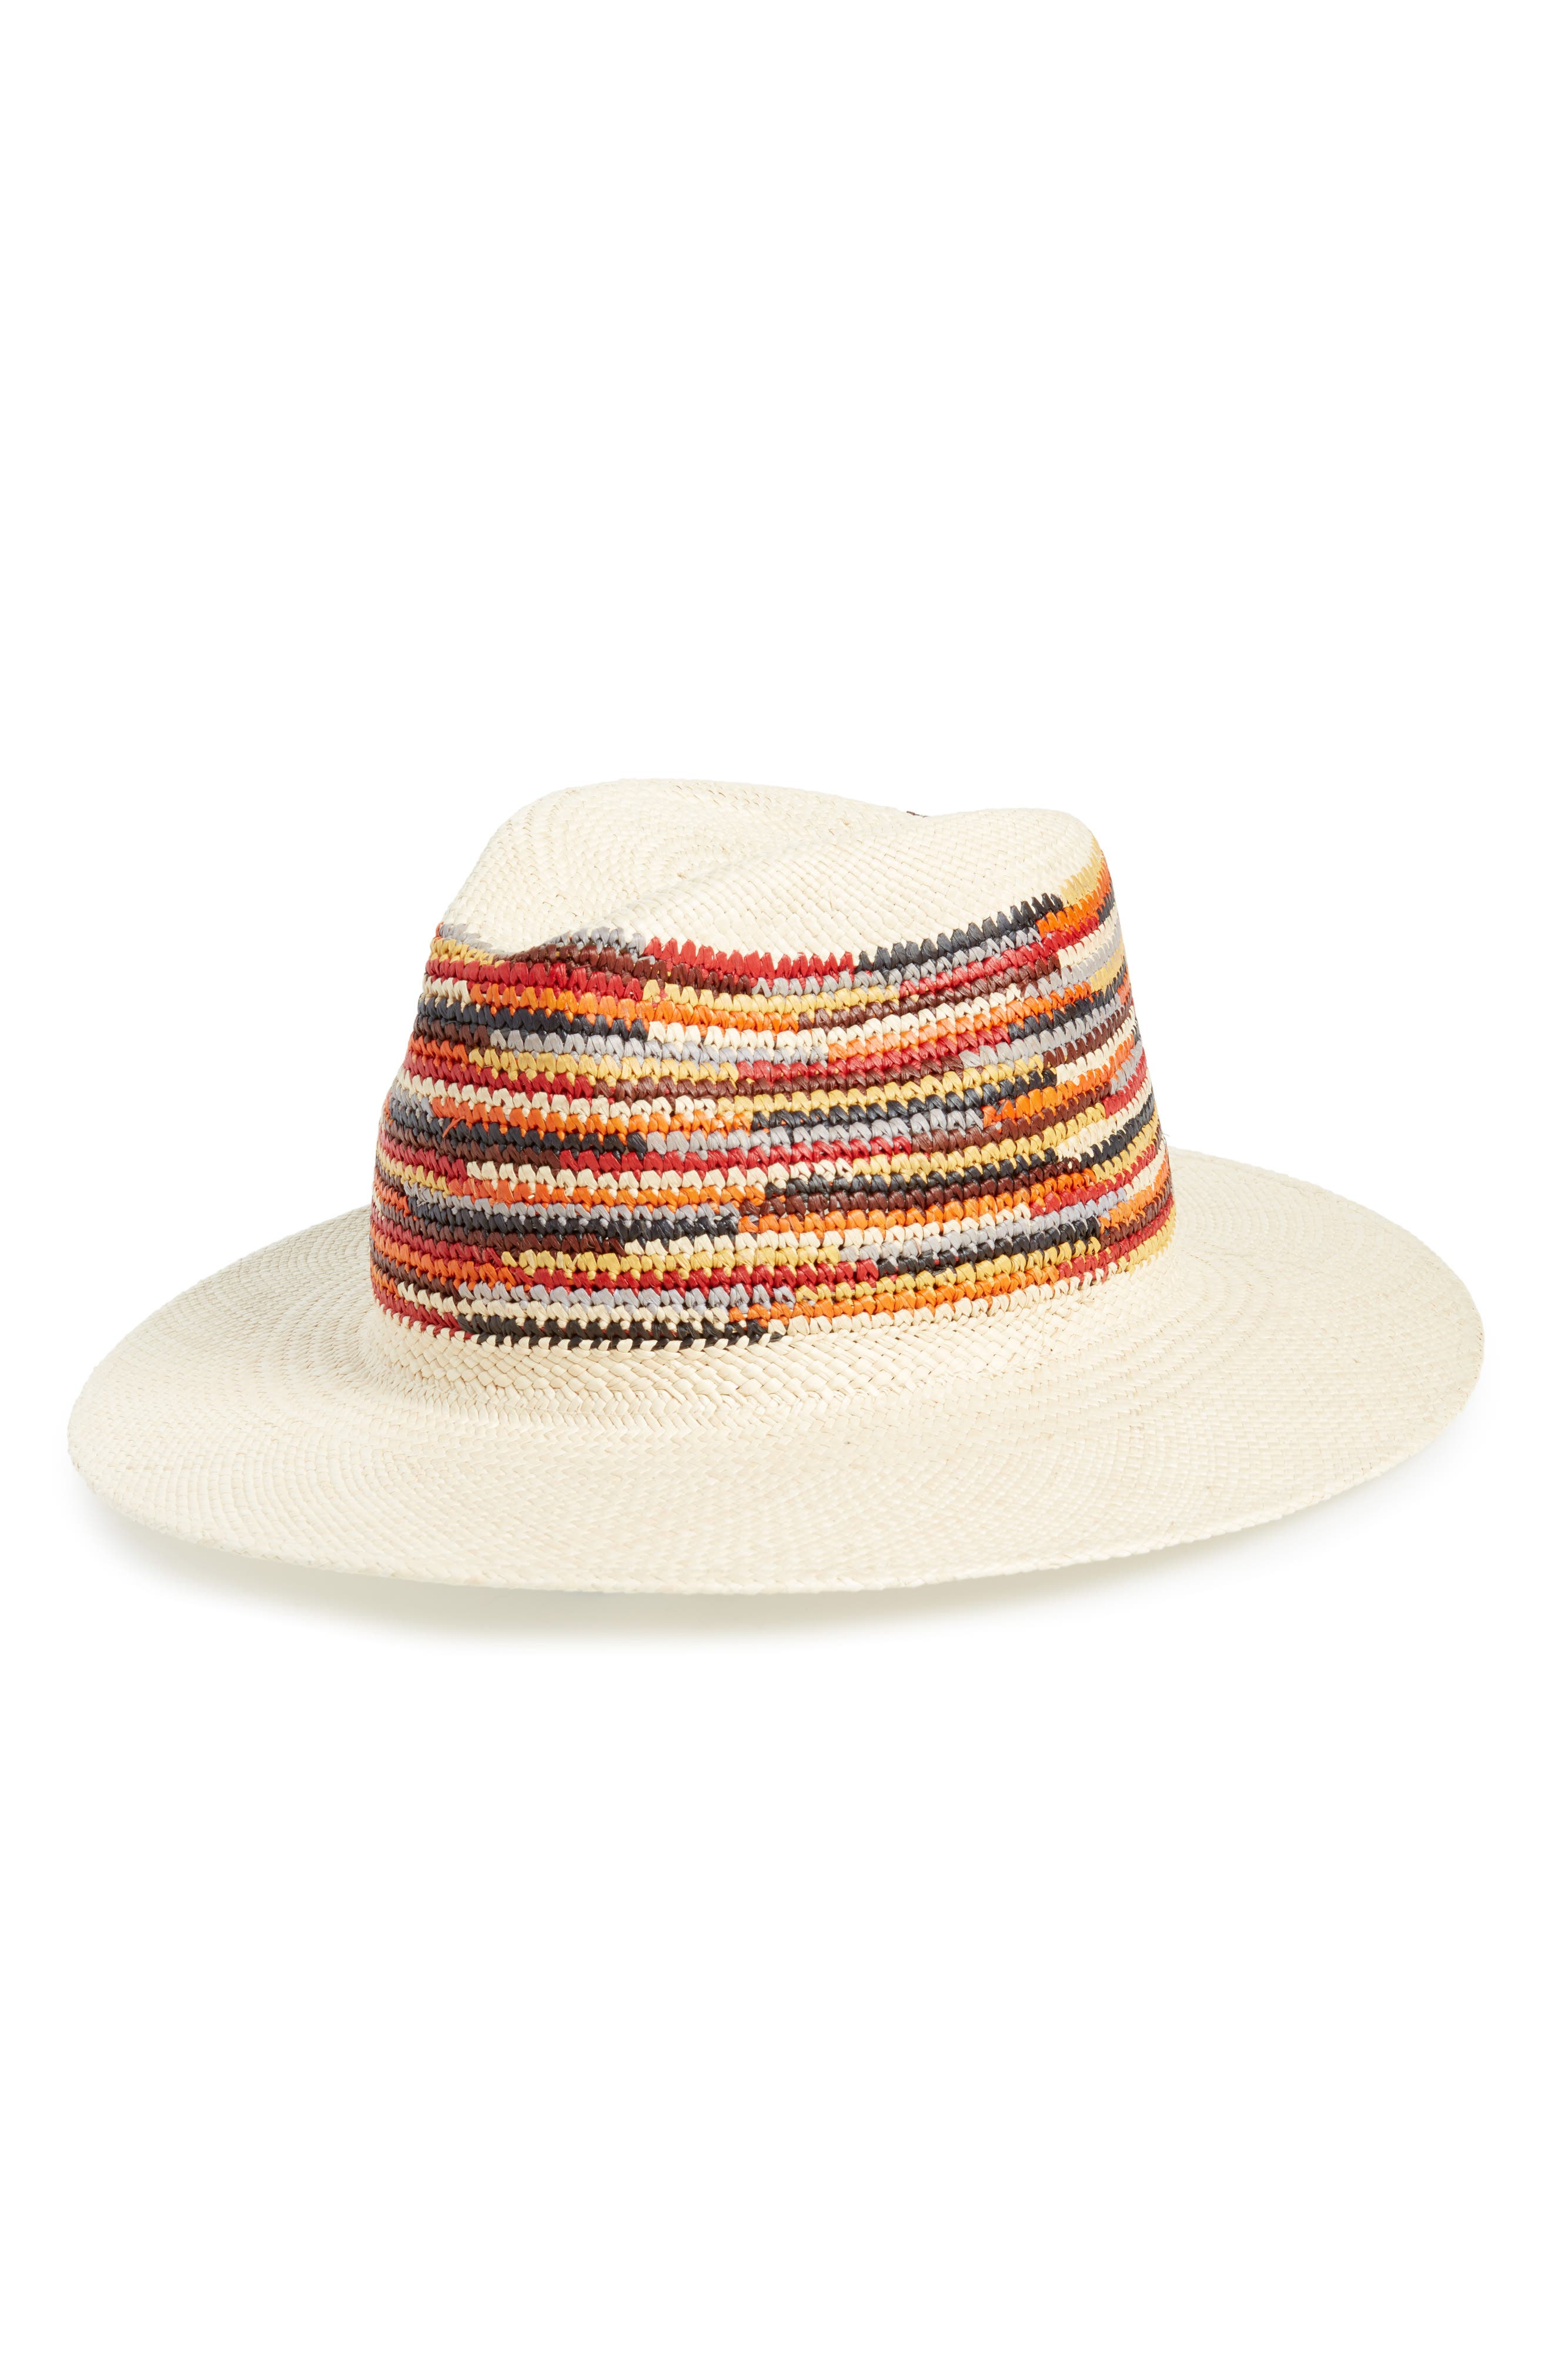 Panama Straw Hat,                         Main,                         color, RED MULTI